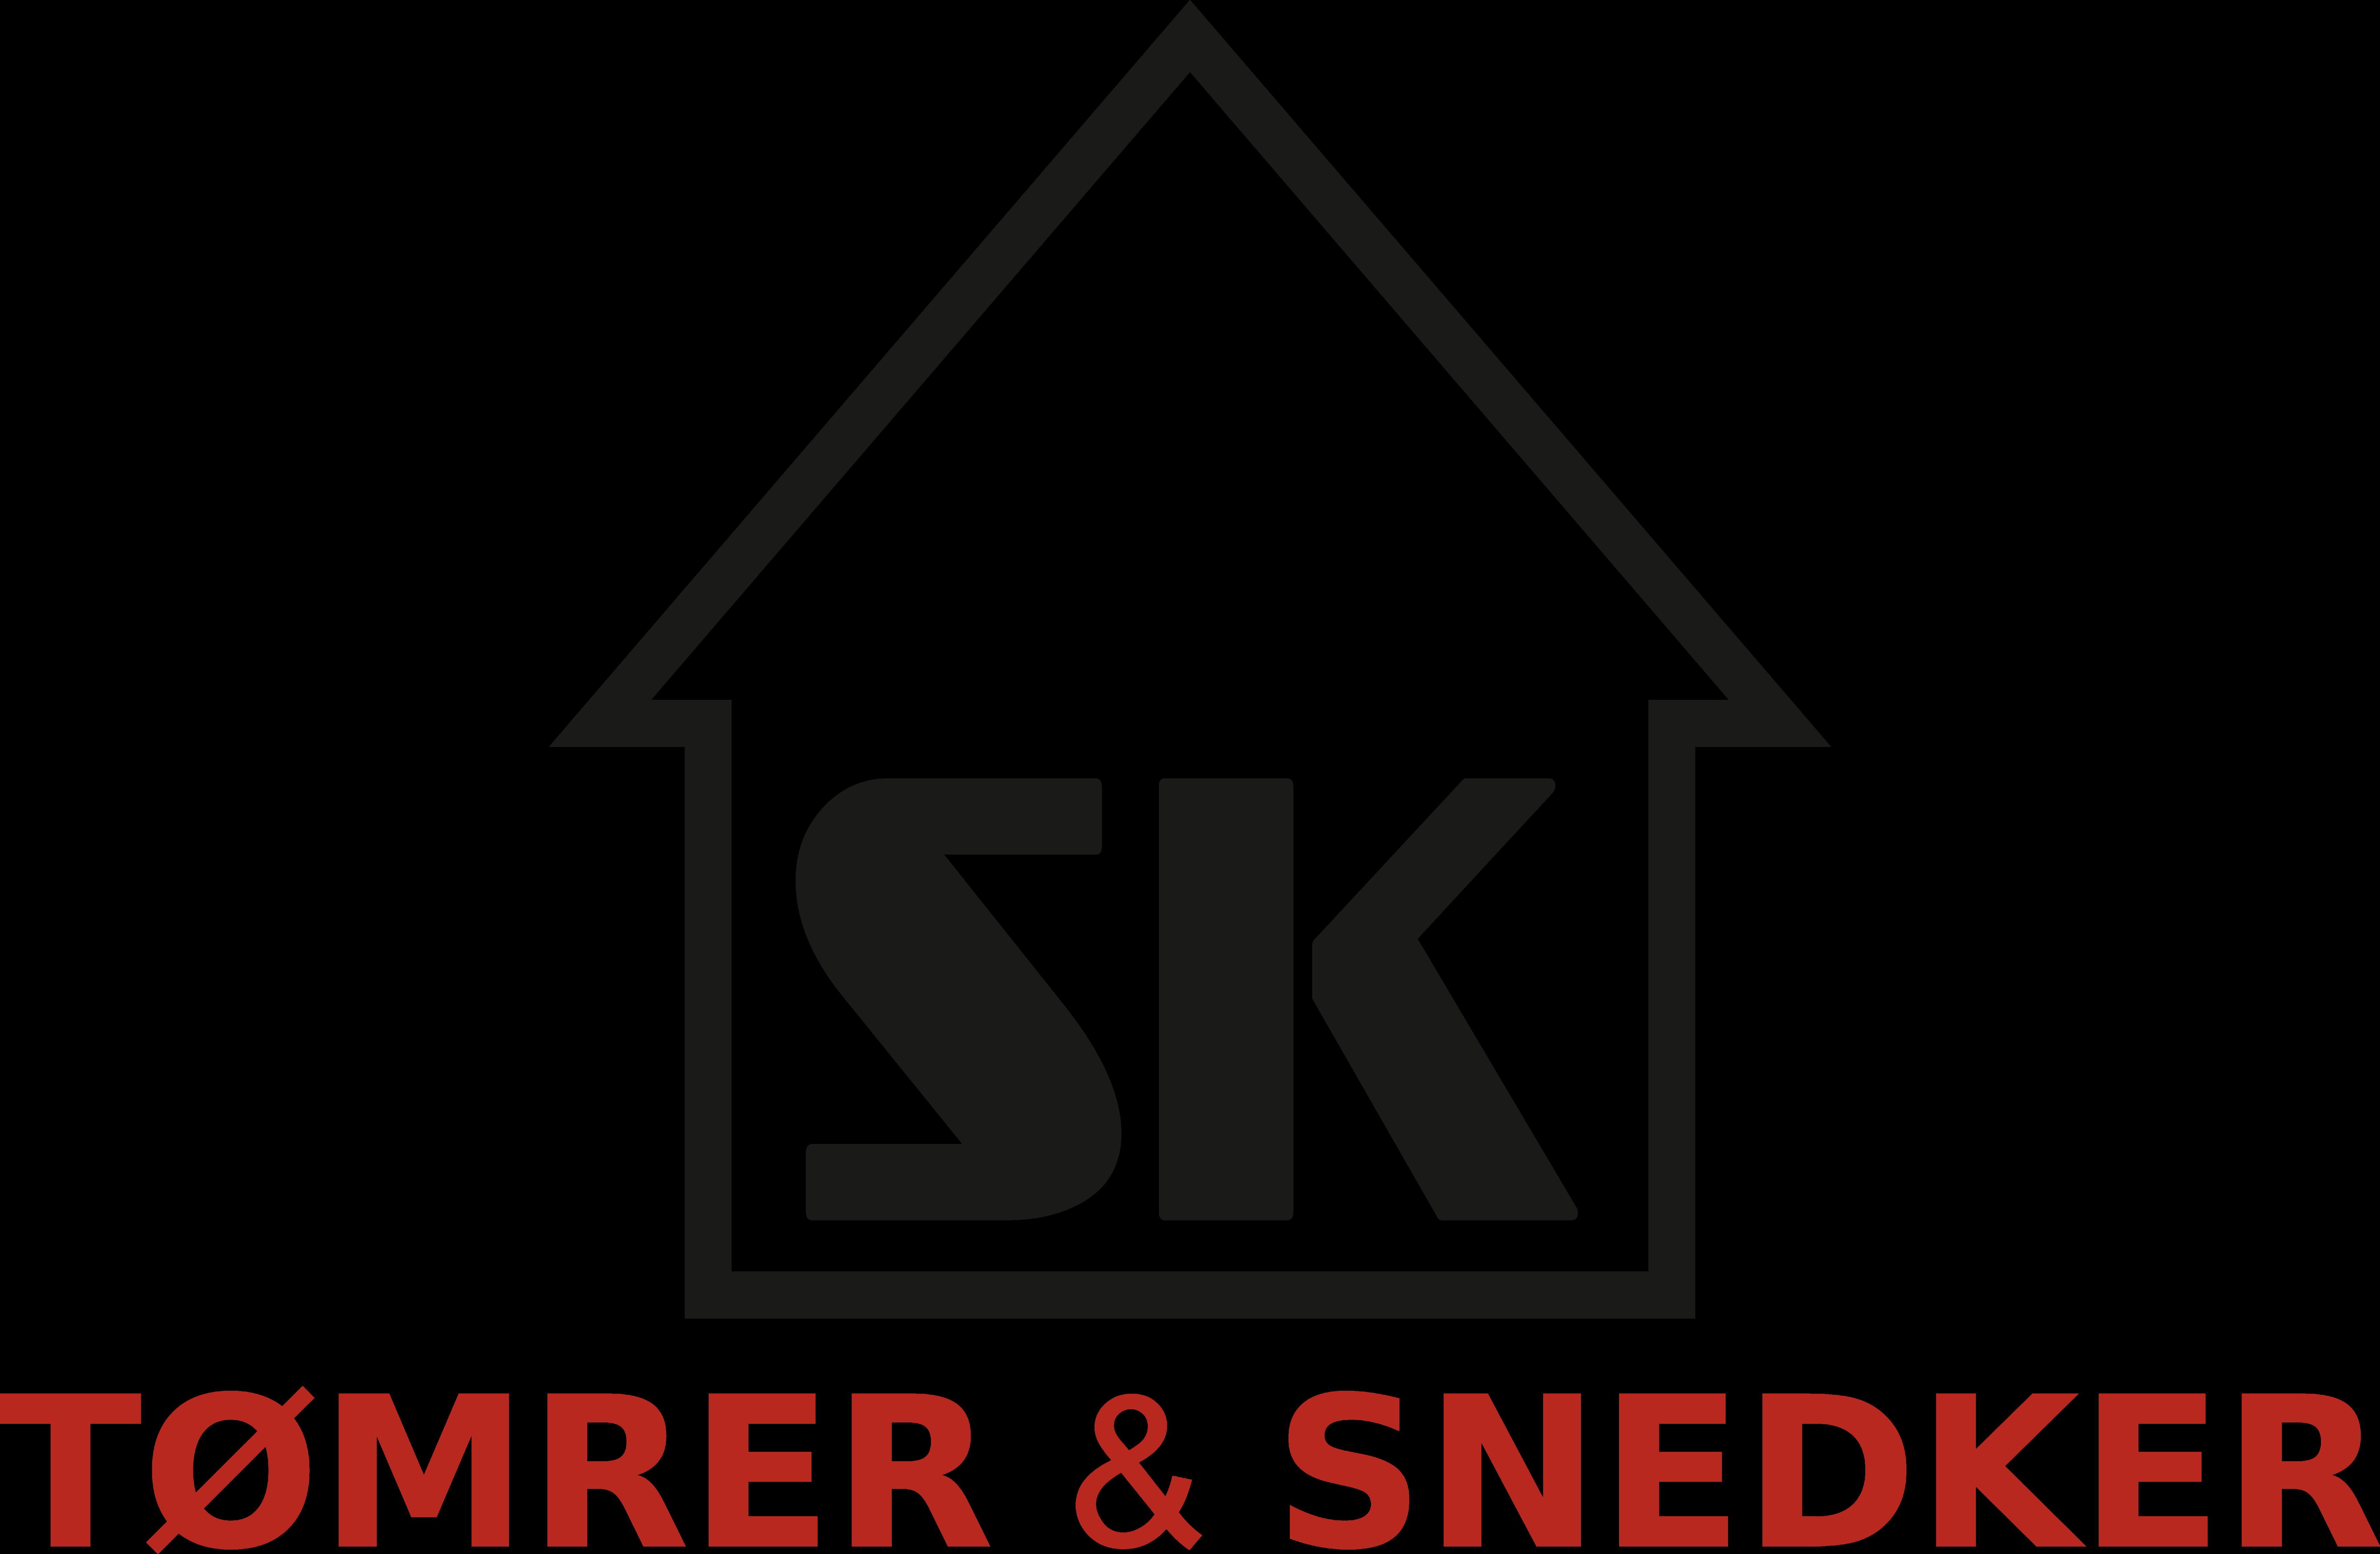 SK Tømrer & snedker